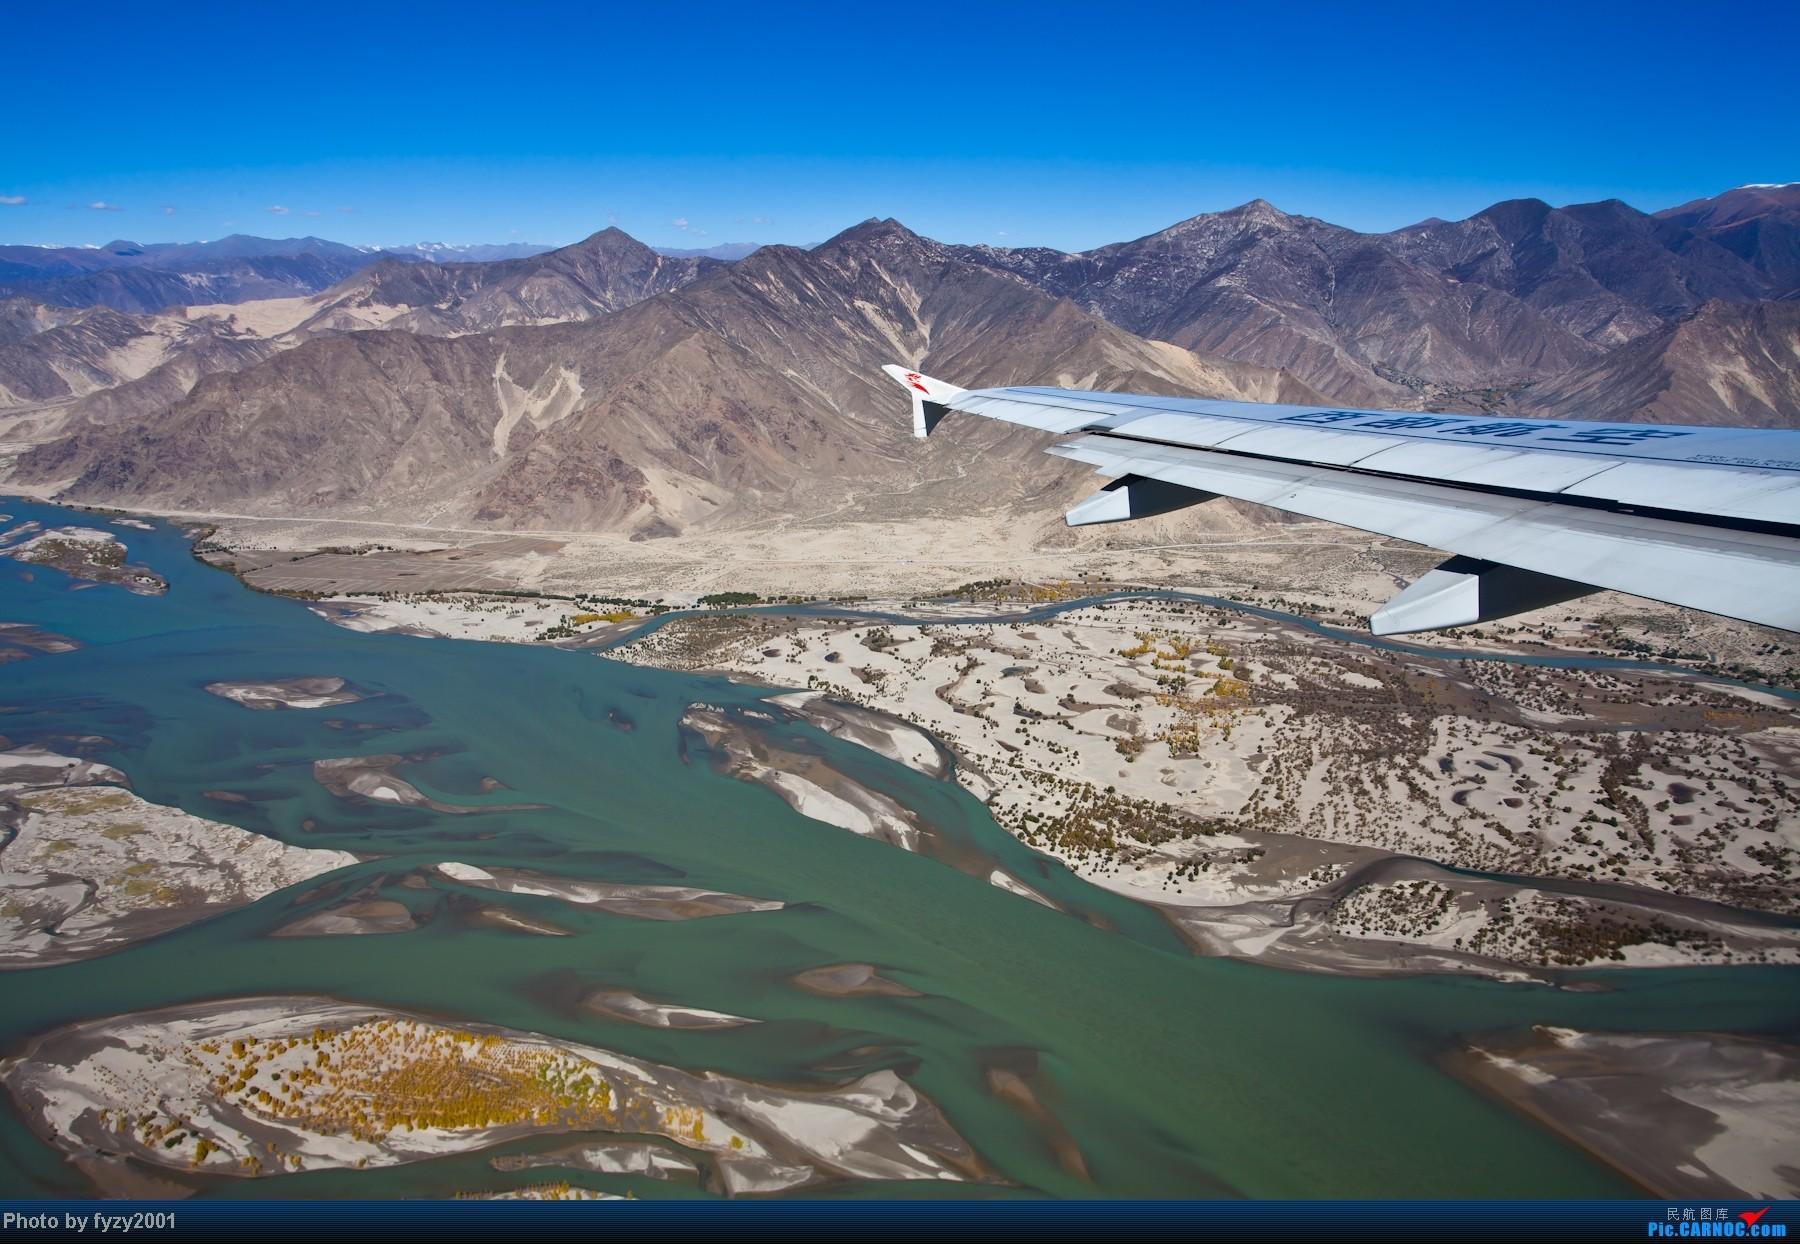 Re:[原创][无锡西站]国庆长假第四次进藏神山圣湖之旅-火车进飞机出(1800大图)